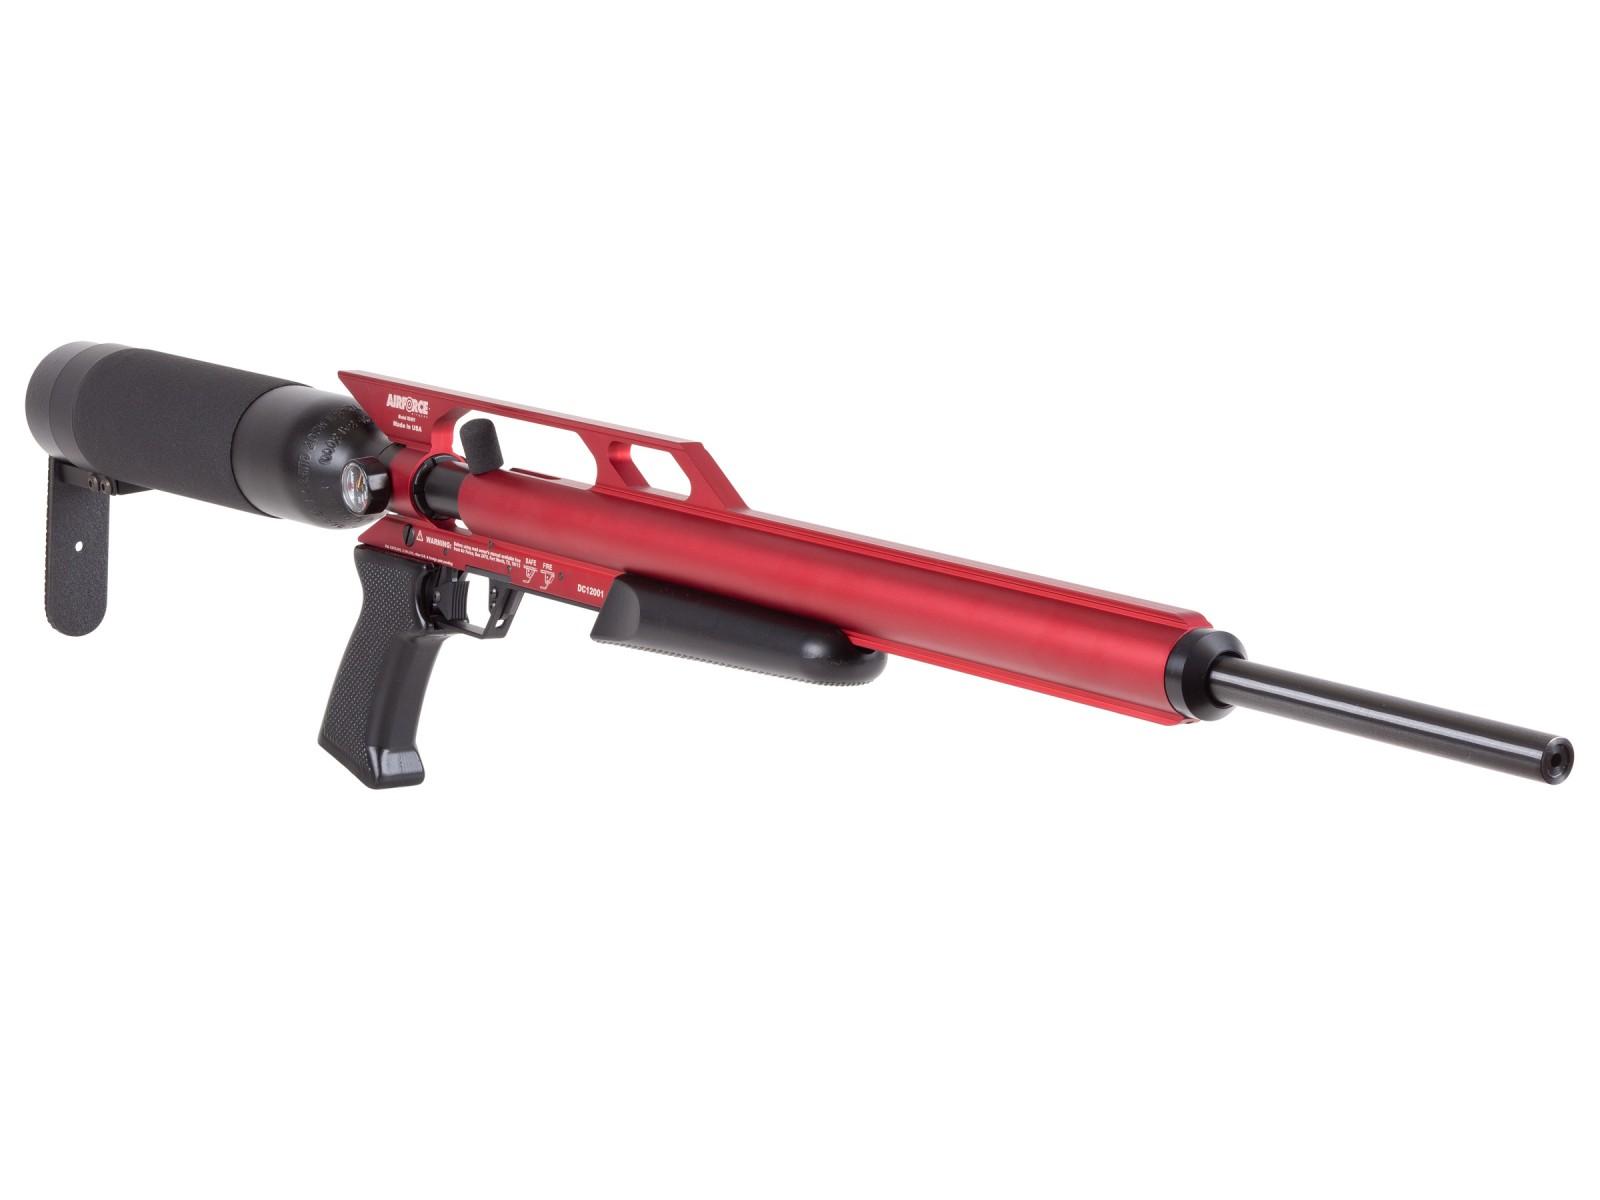 AirForce Condor PCP Air Rifle, Spin-Loc Tank, Red